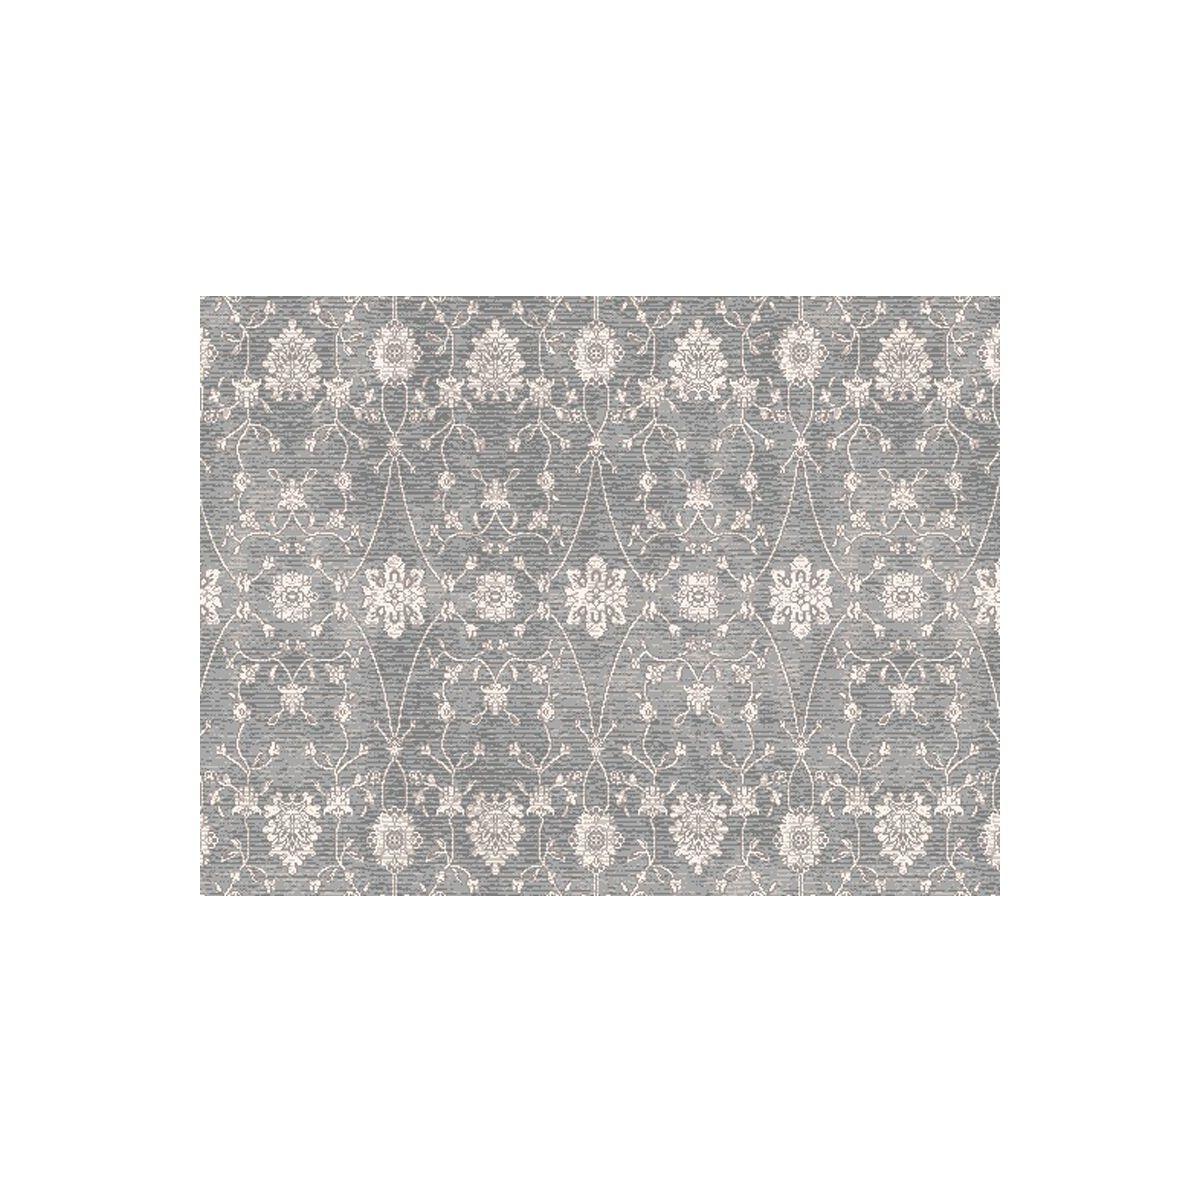 13 X 15 Mont Blanc Ornamental Motifs Gray And Ivory Rectangular